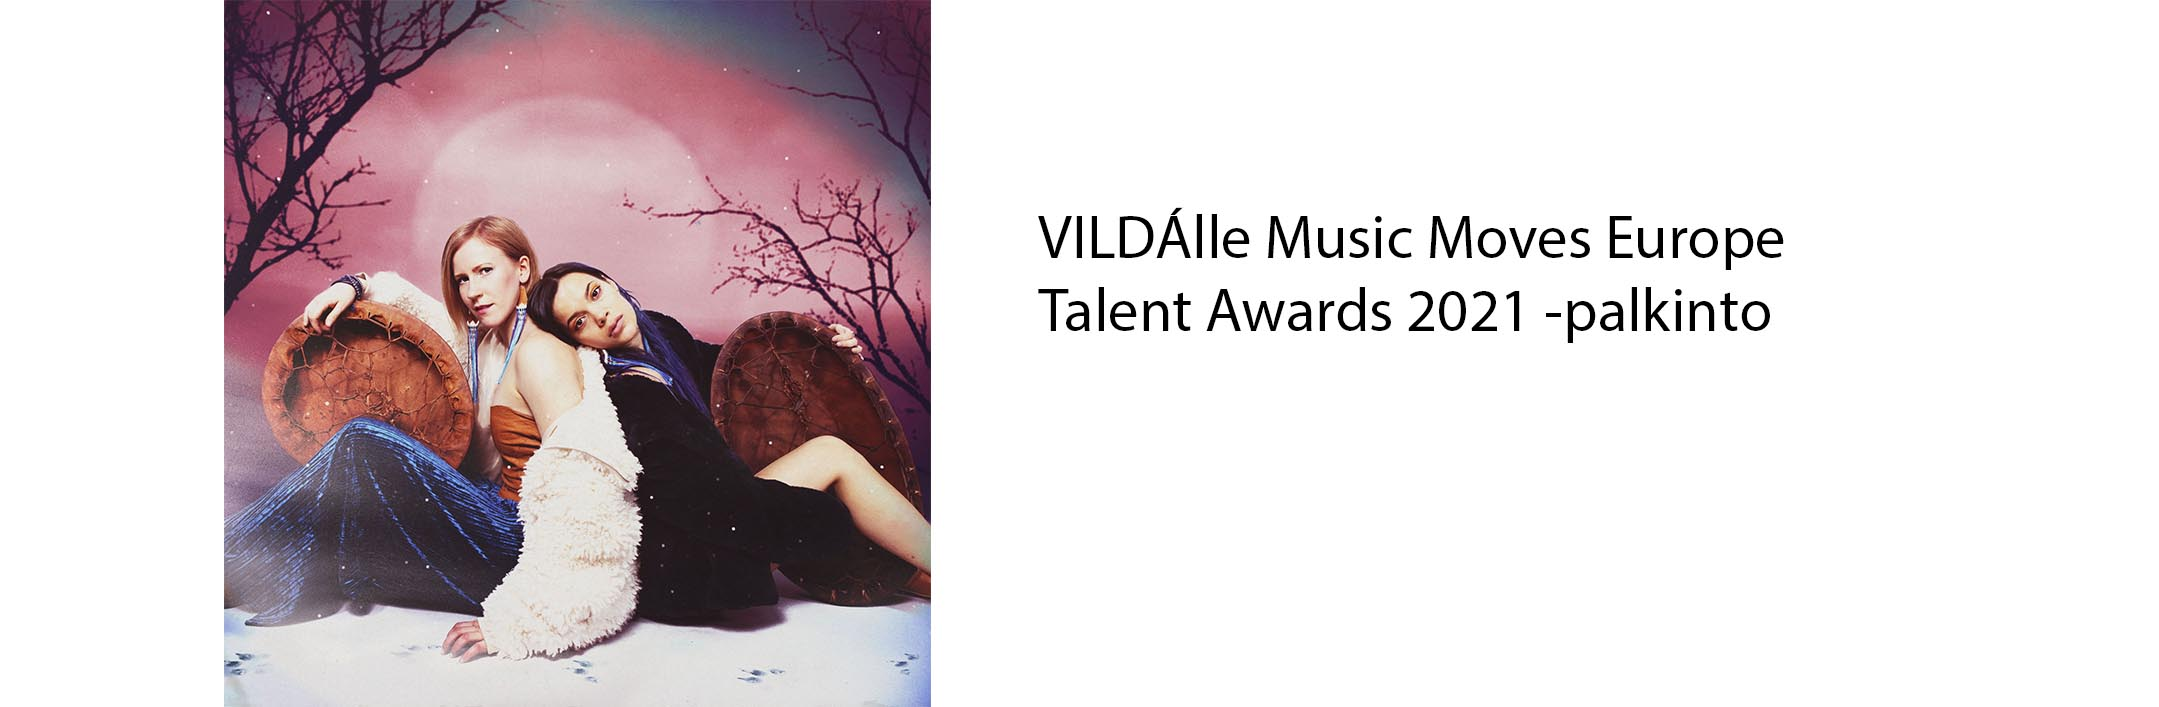 VILDÁlle Music Moves Europe Talent Awards 2021 -palkinto